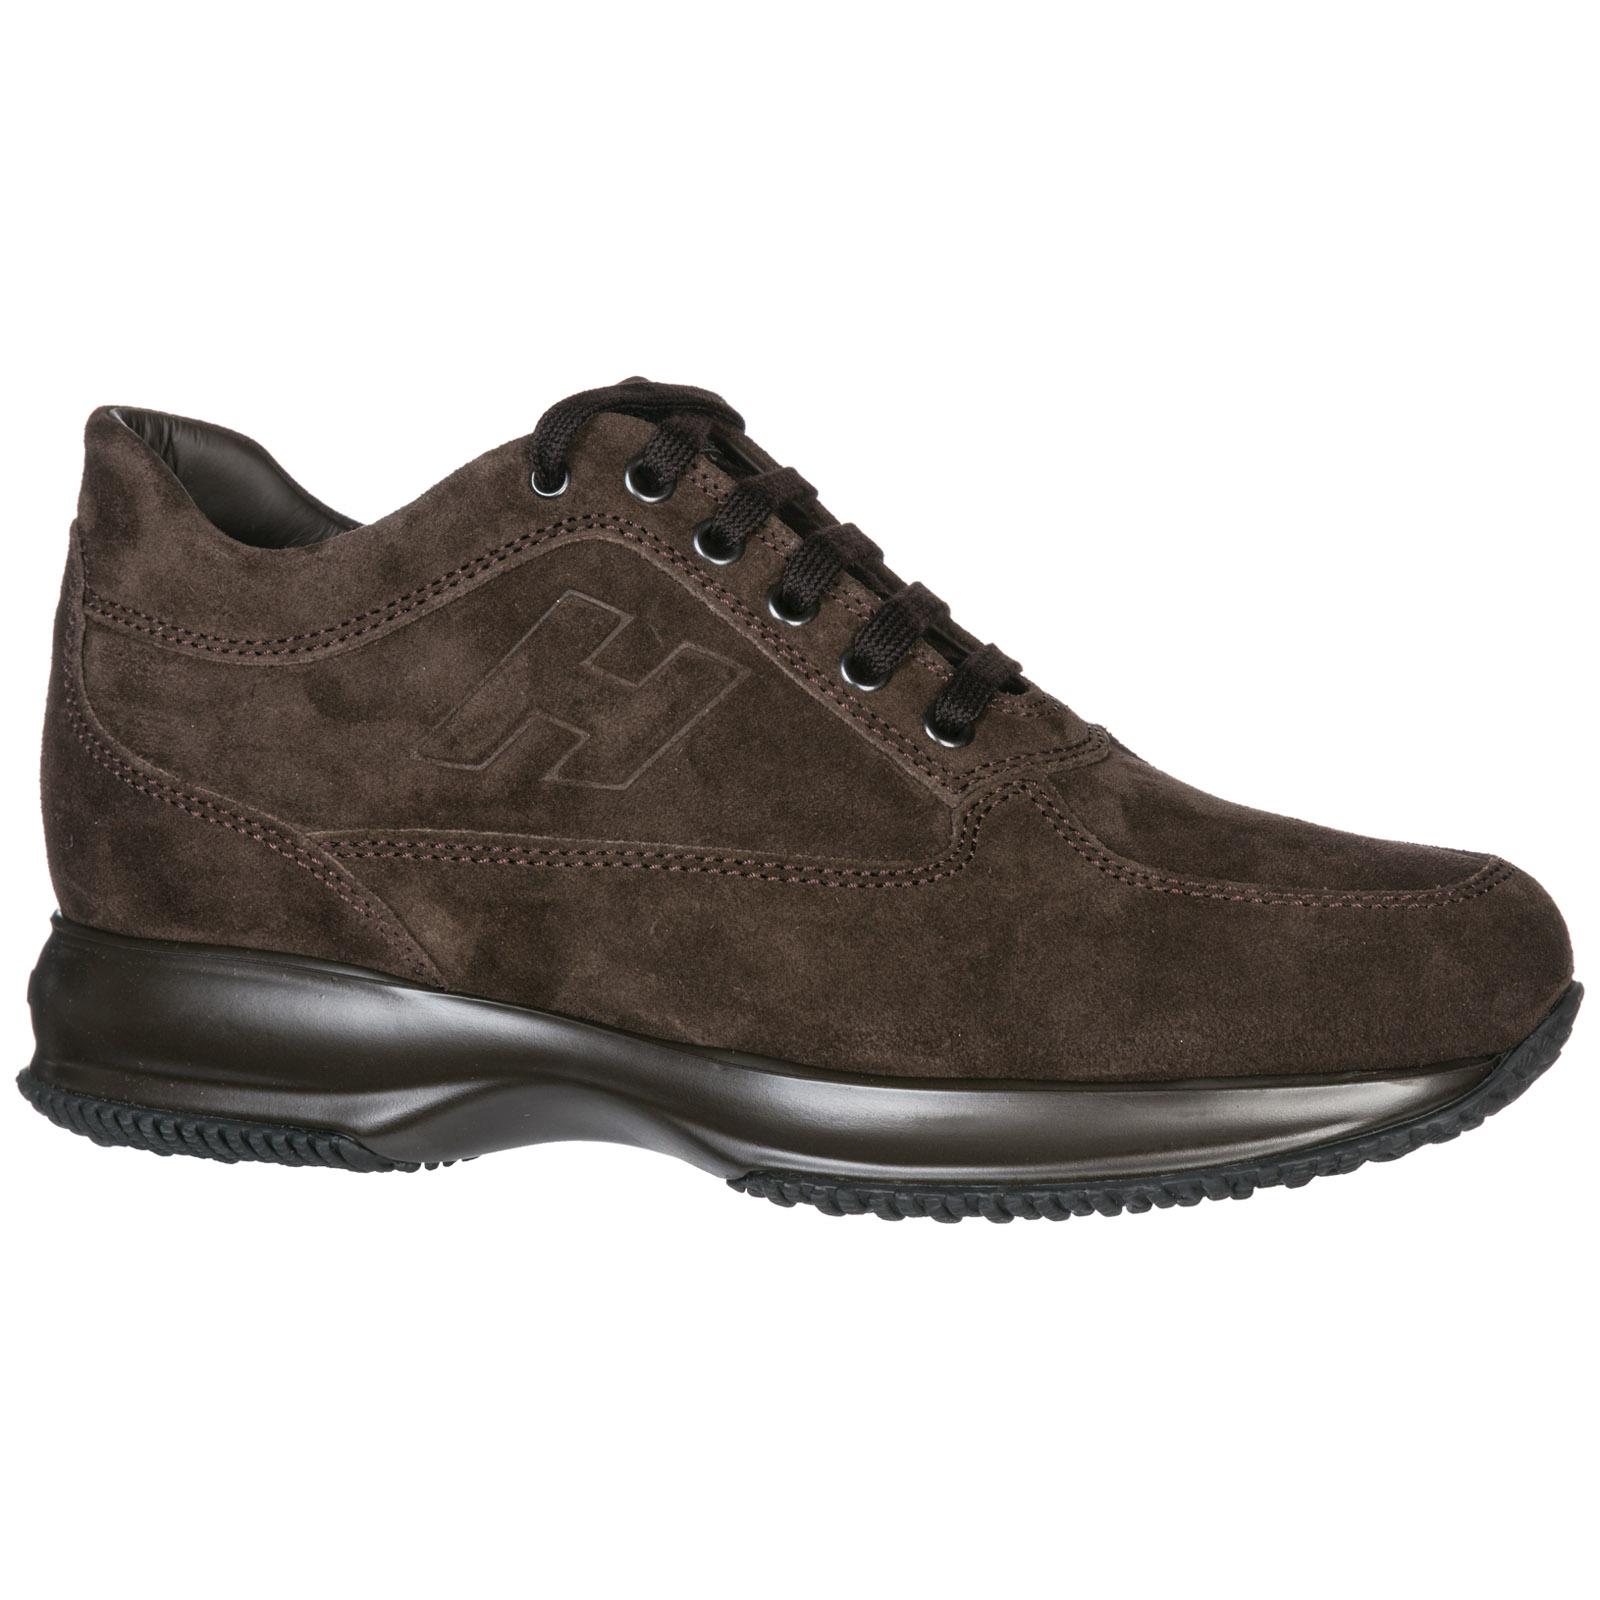 hogan shoes mens off 73% - axnosis.co.uk